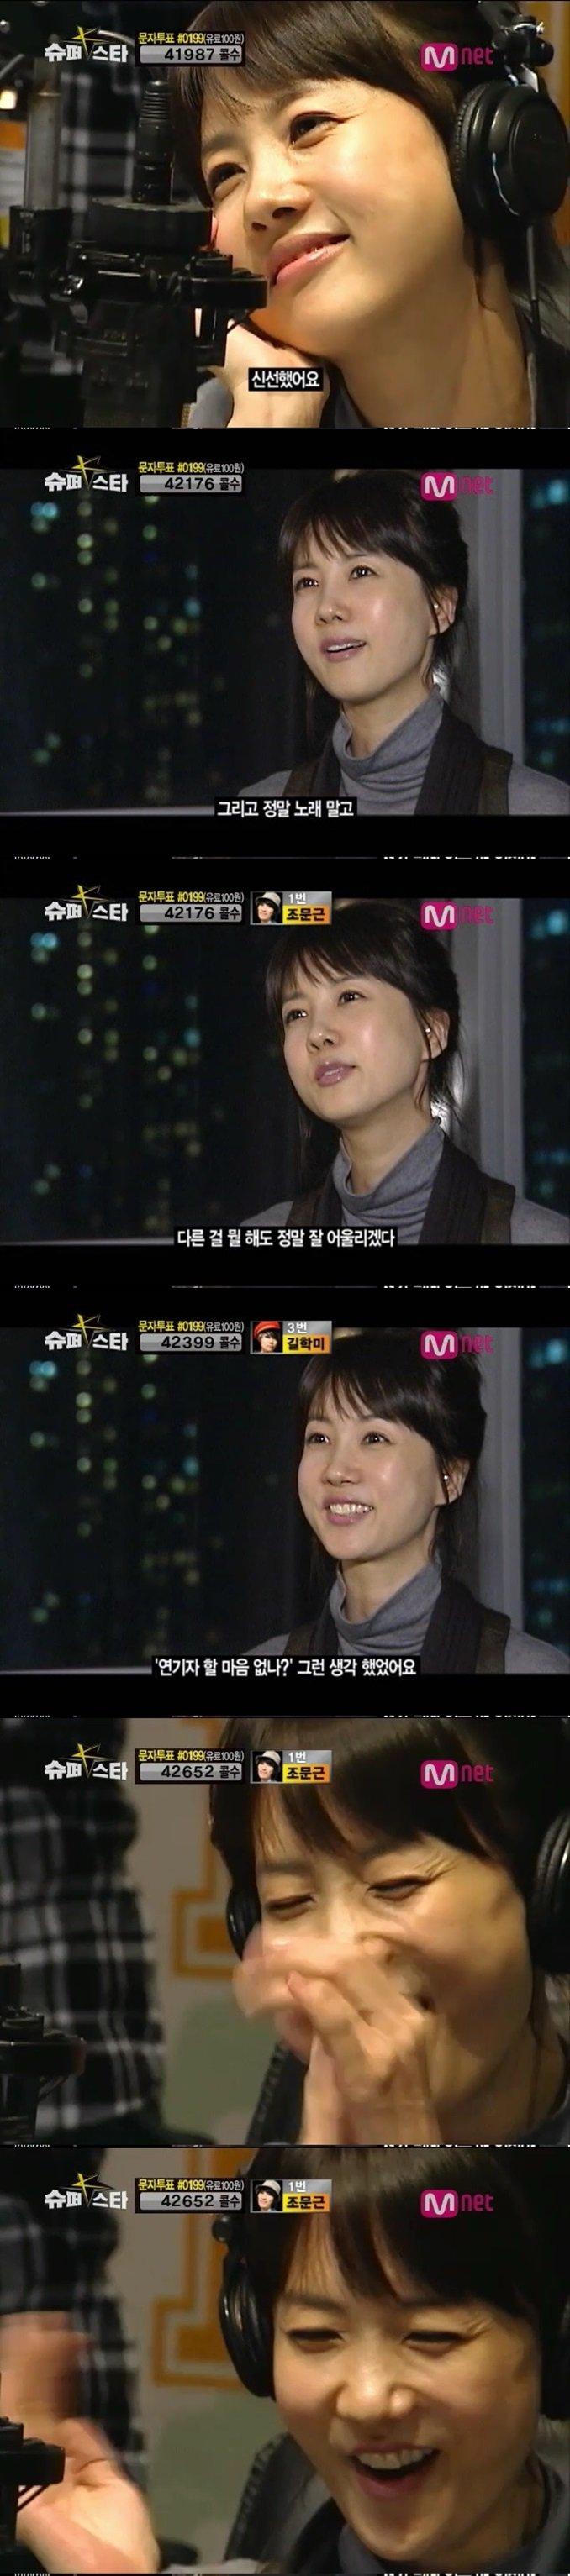 04.jpg 서인국이 연기로 뜰줄 알았떤 연예계 최고의 아이돌덕후.JPG